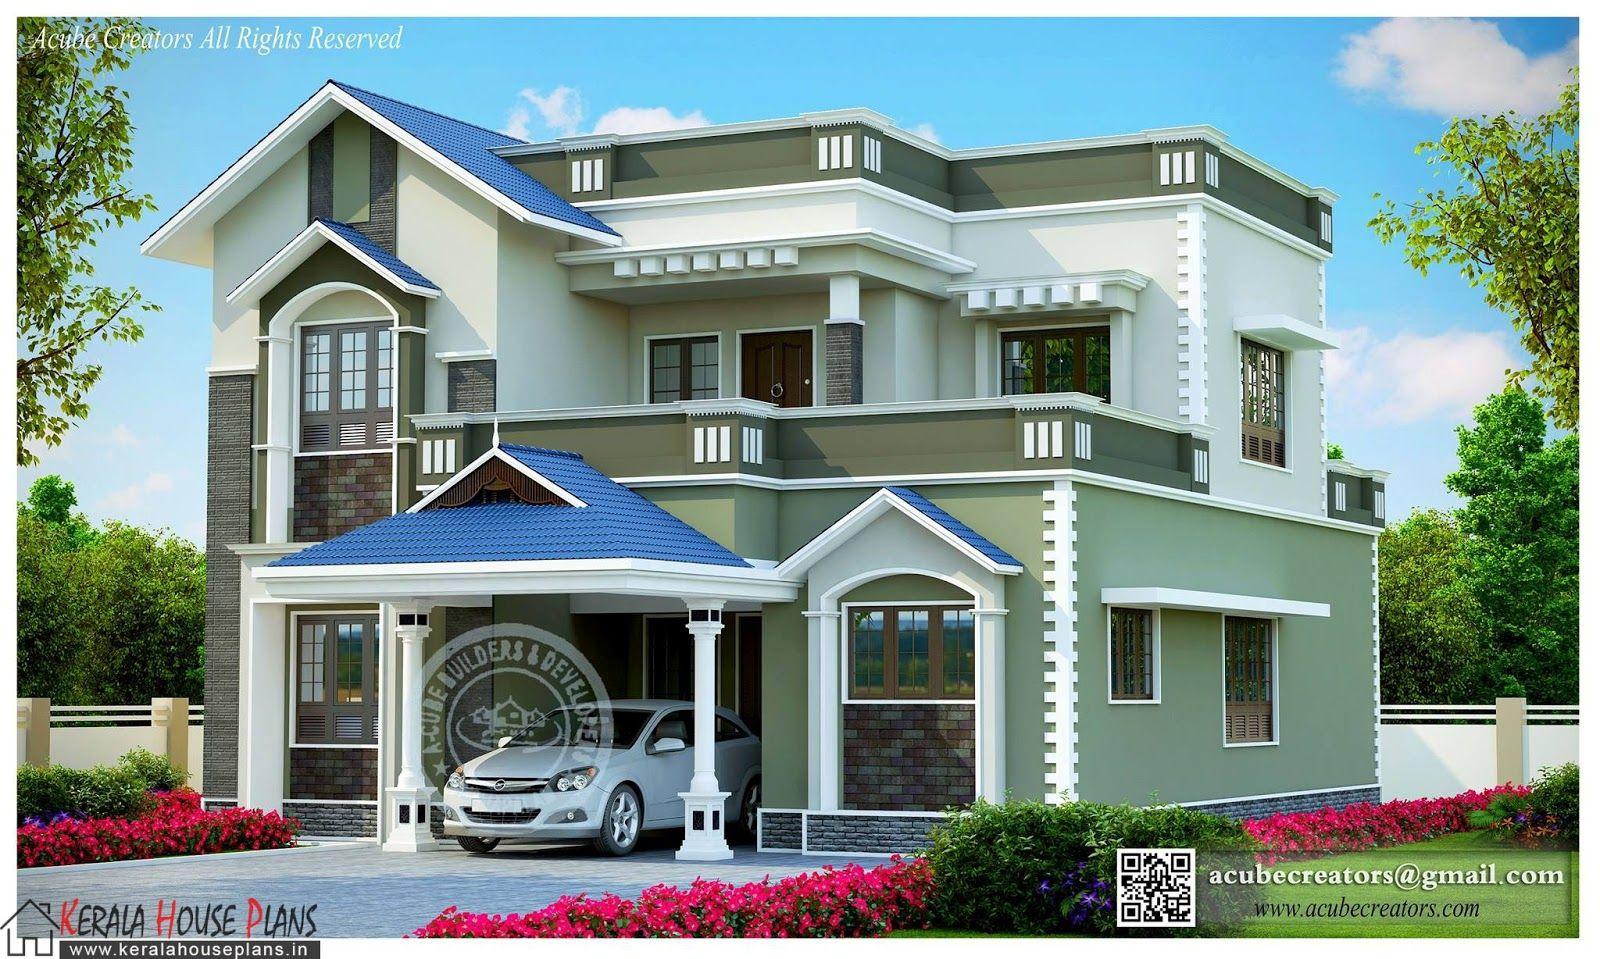 1800sqft Mixed Roof Kerala House Design Kerala House Plans Designs Floor Plans And Elevatio Kerala House Design Modern Small House Design Cool House Designs